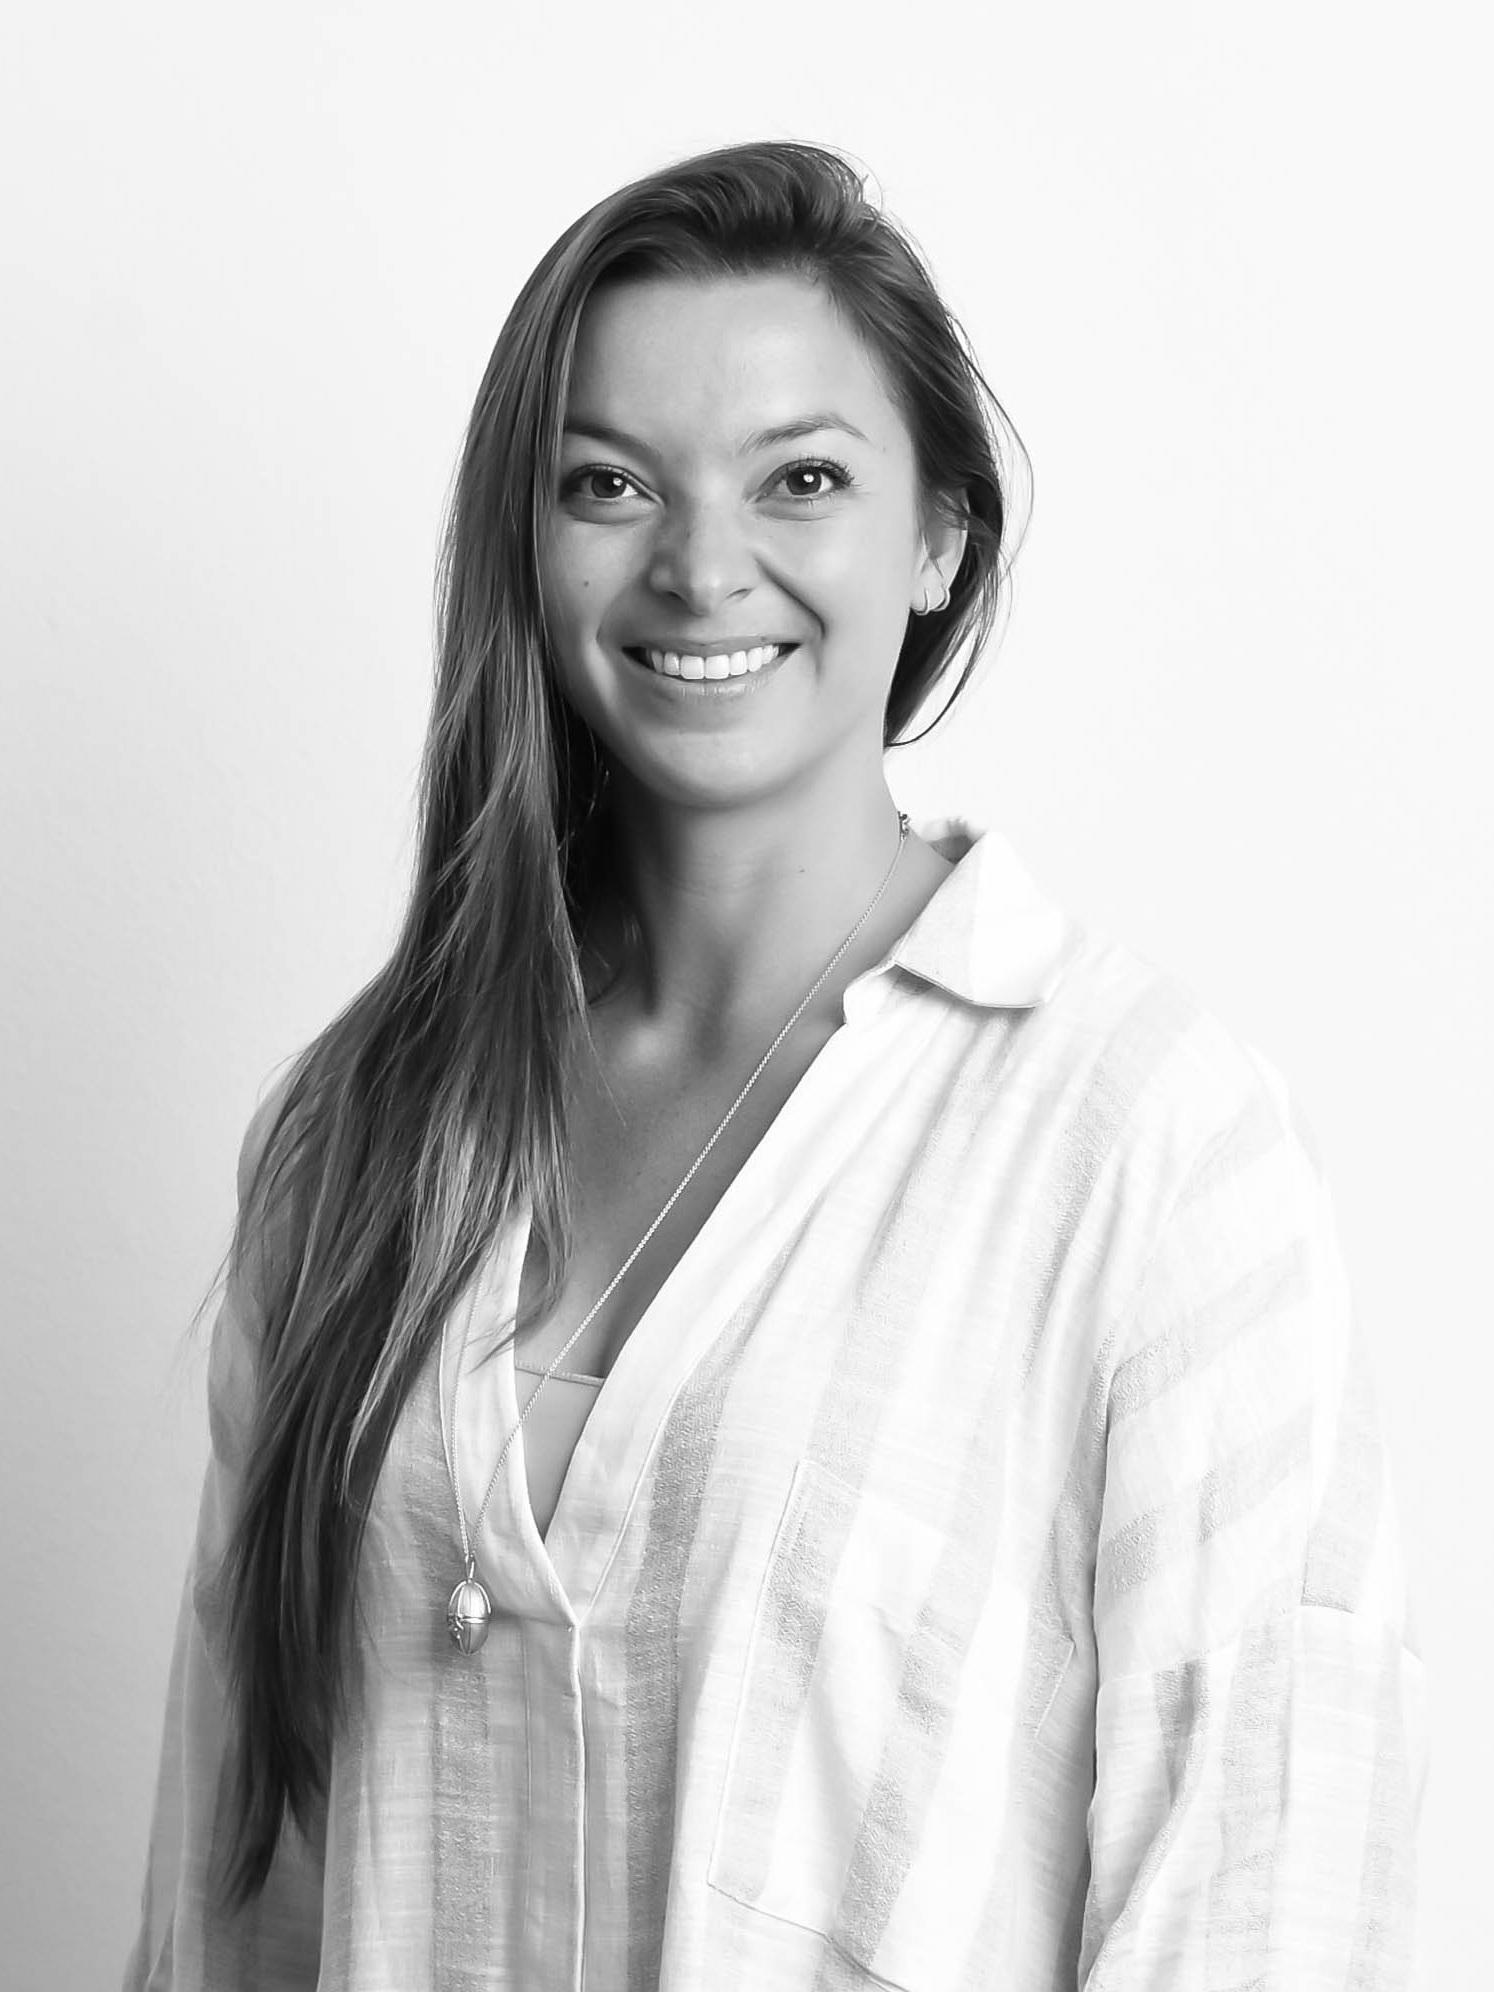 sarah-irvine-truewellbeing-brand-manager-digital-content-creator.jpg